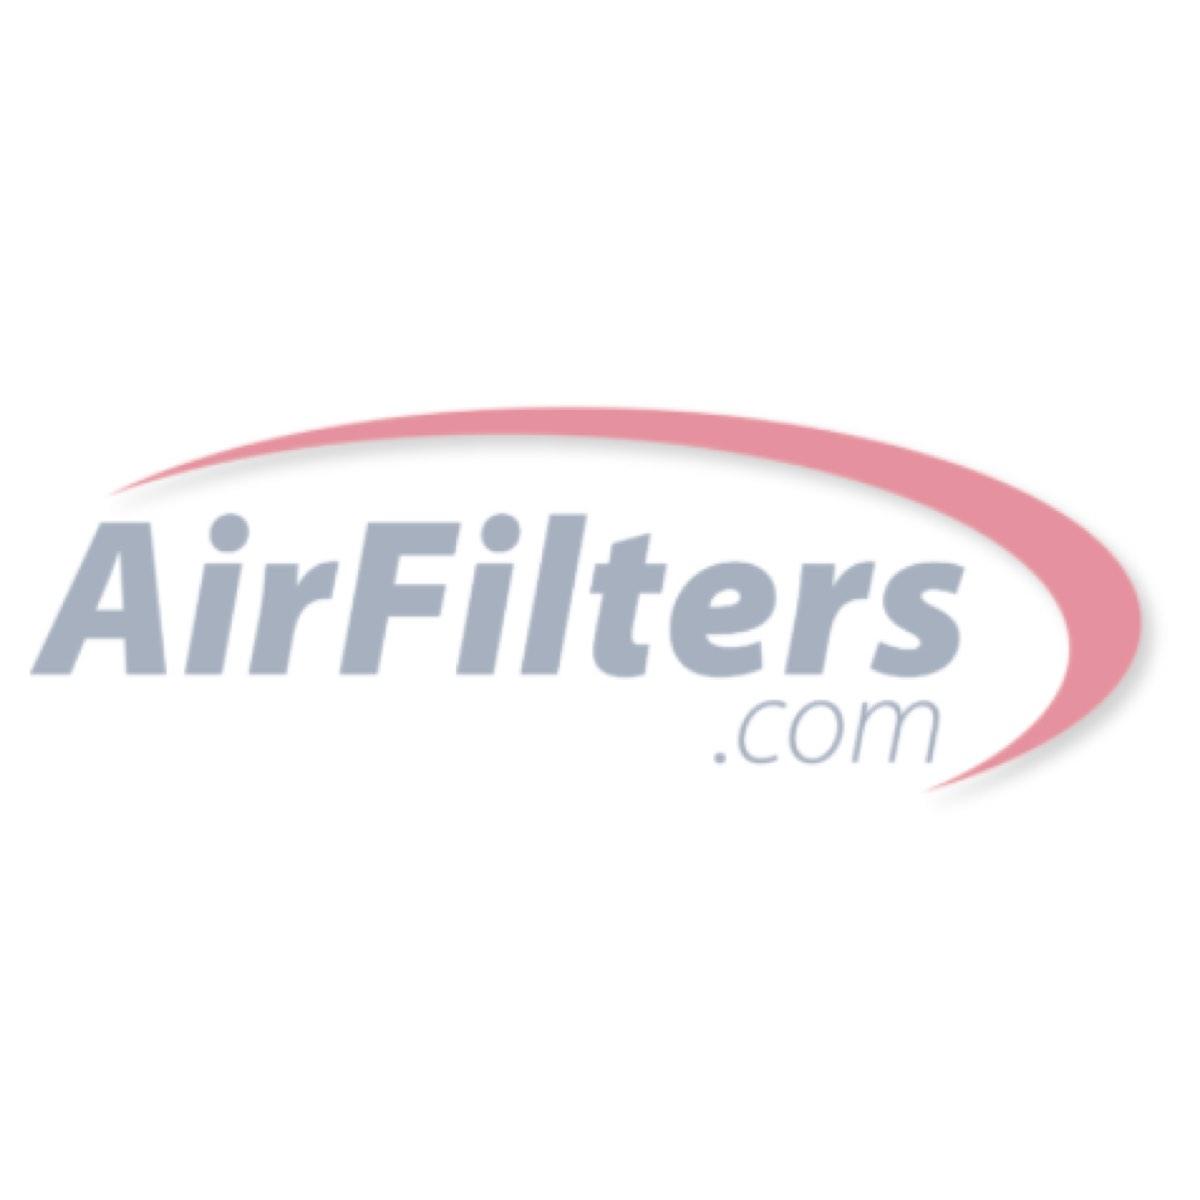 York 20x20x5 (19.75x19.88x4.38) Air Filters